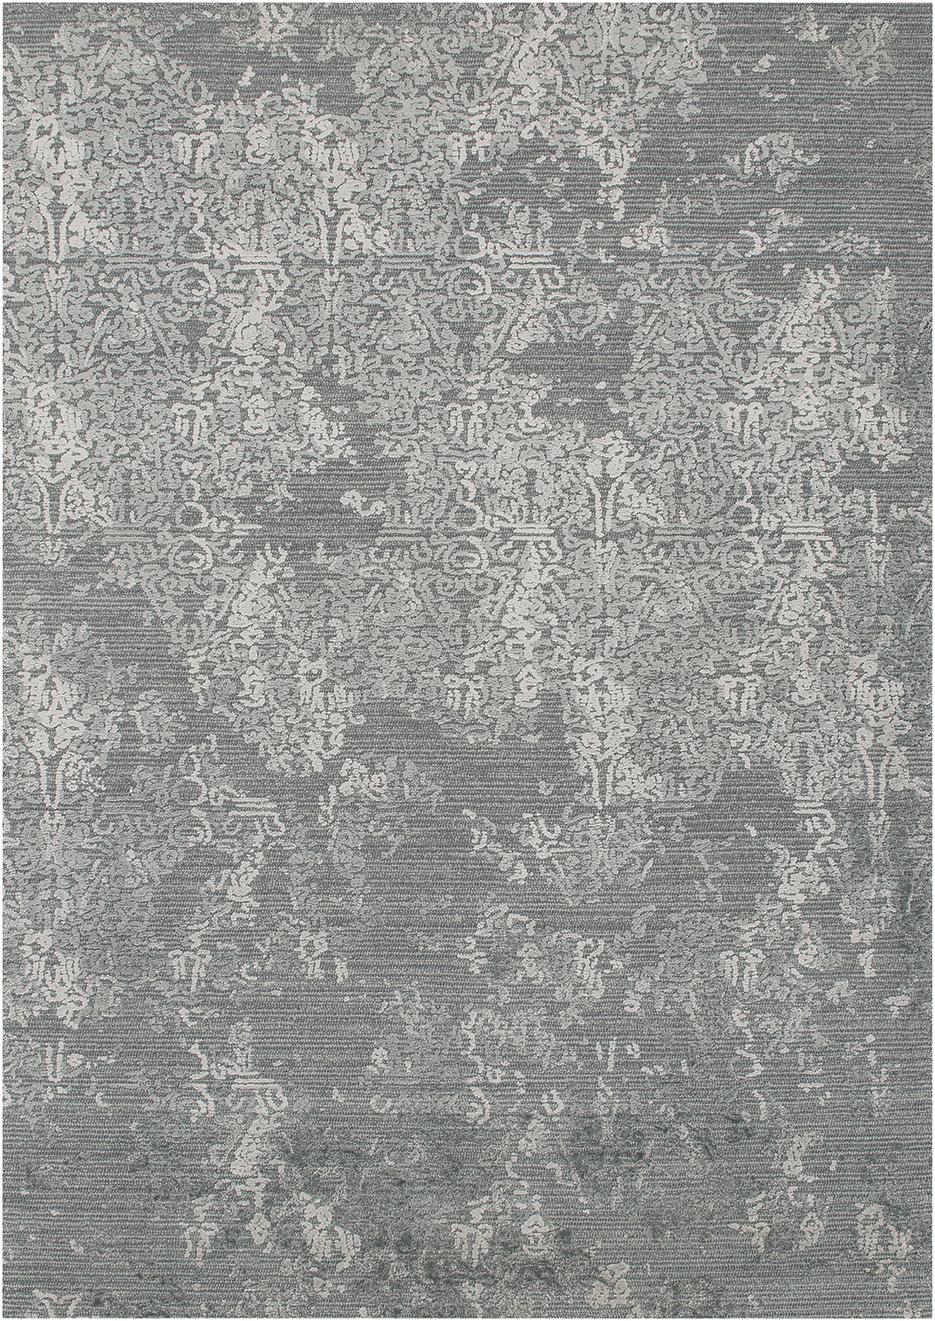 LACE (8).jpg